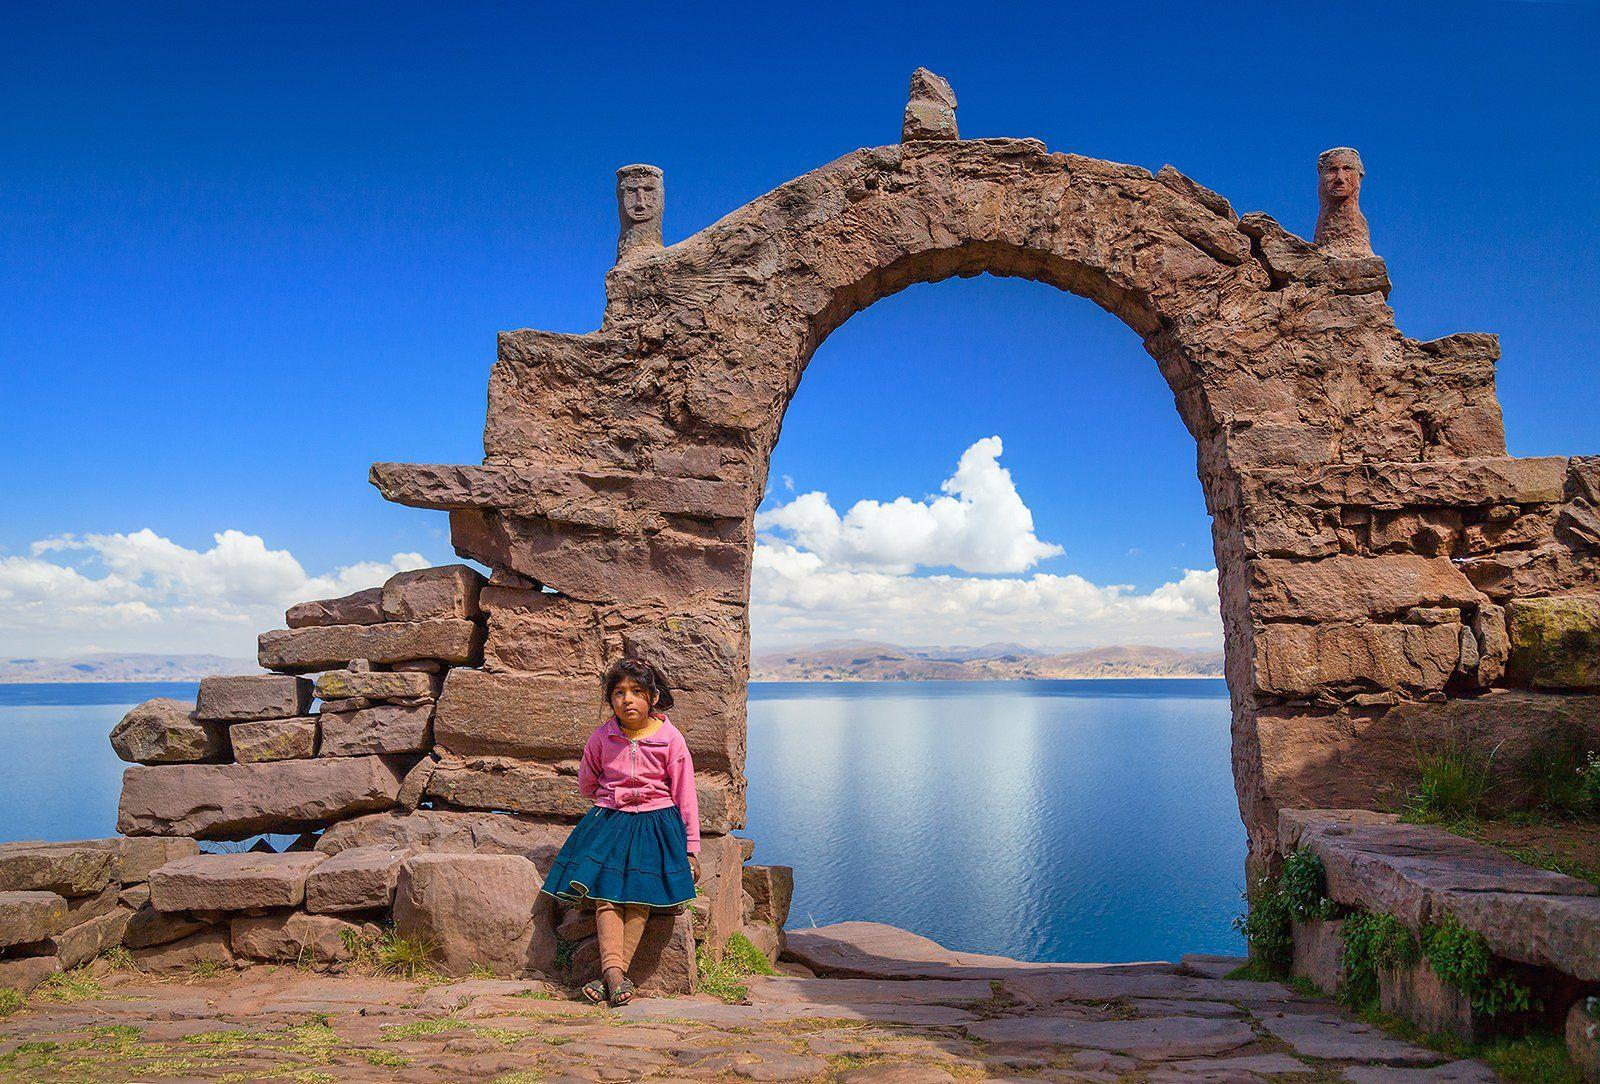 Перу, Титикака, озеро, арка, девочка, остров Такиле, Бирюков Юрий